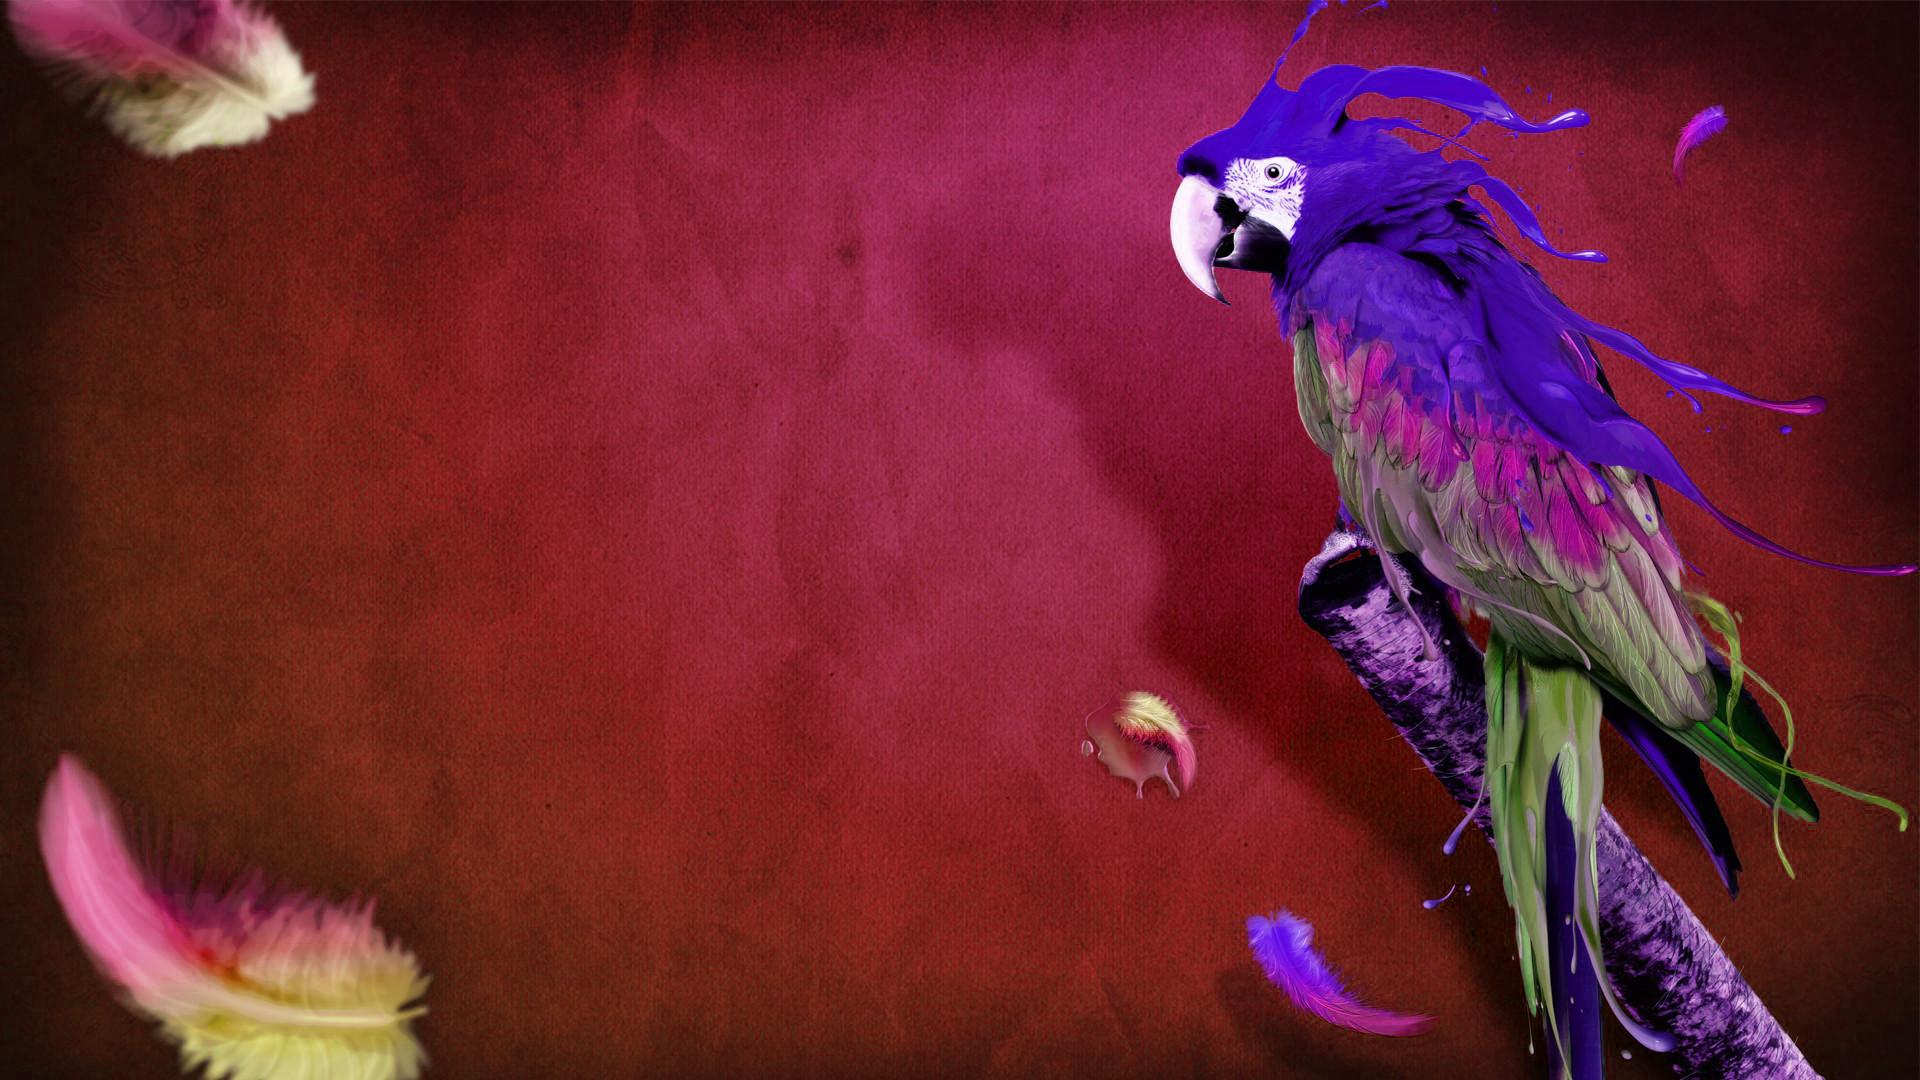 Animated Aquarium Screensaver Free Download For Mobile : Wallpaper download  hd 3d